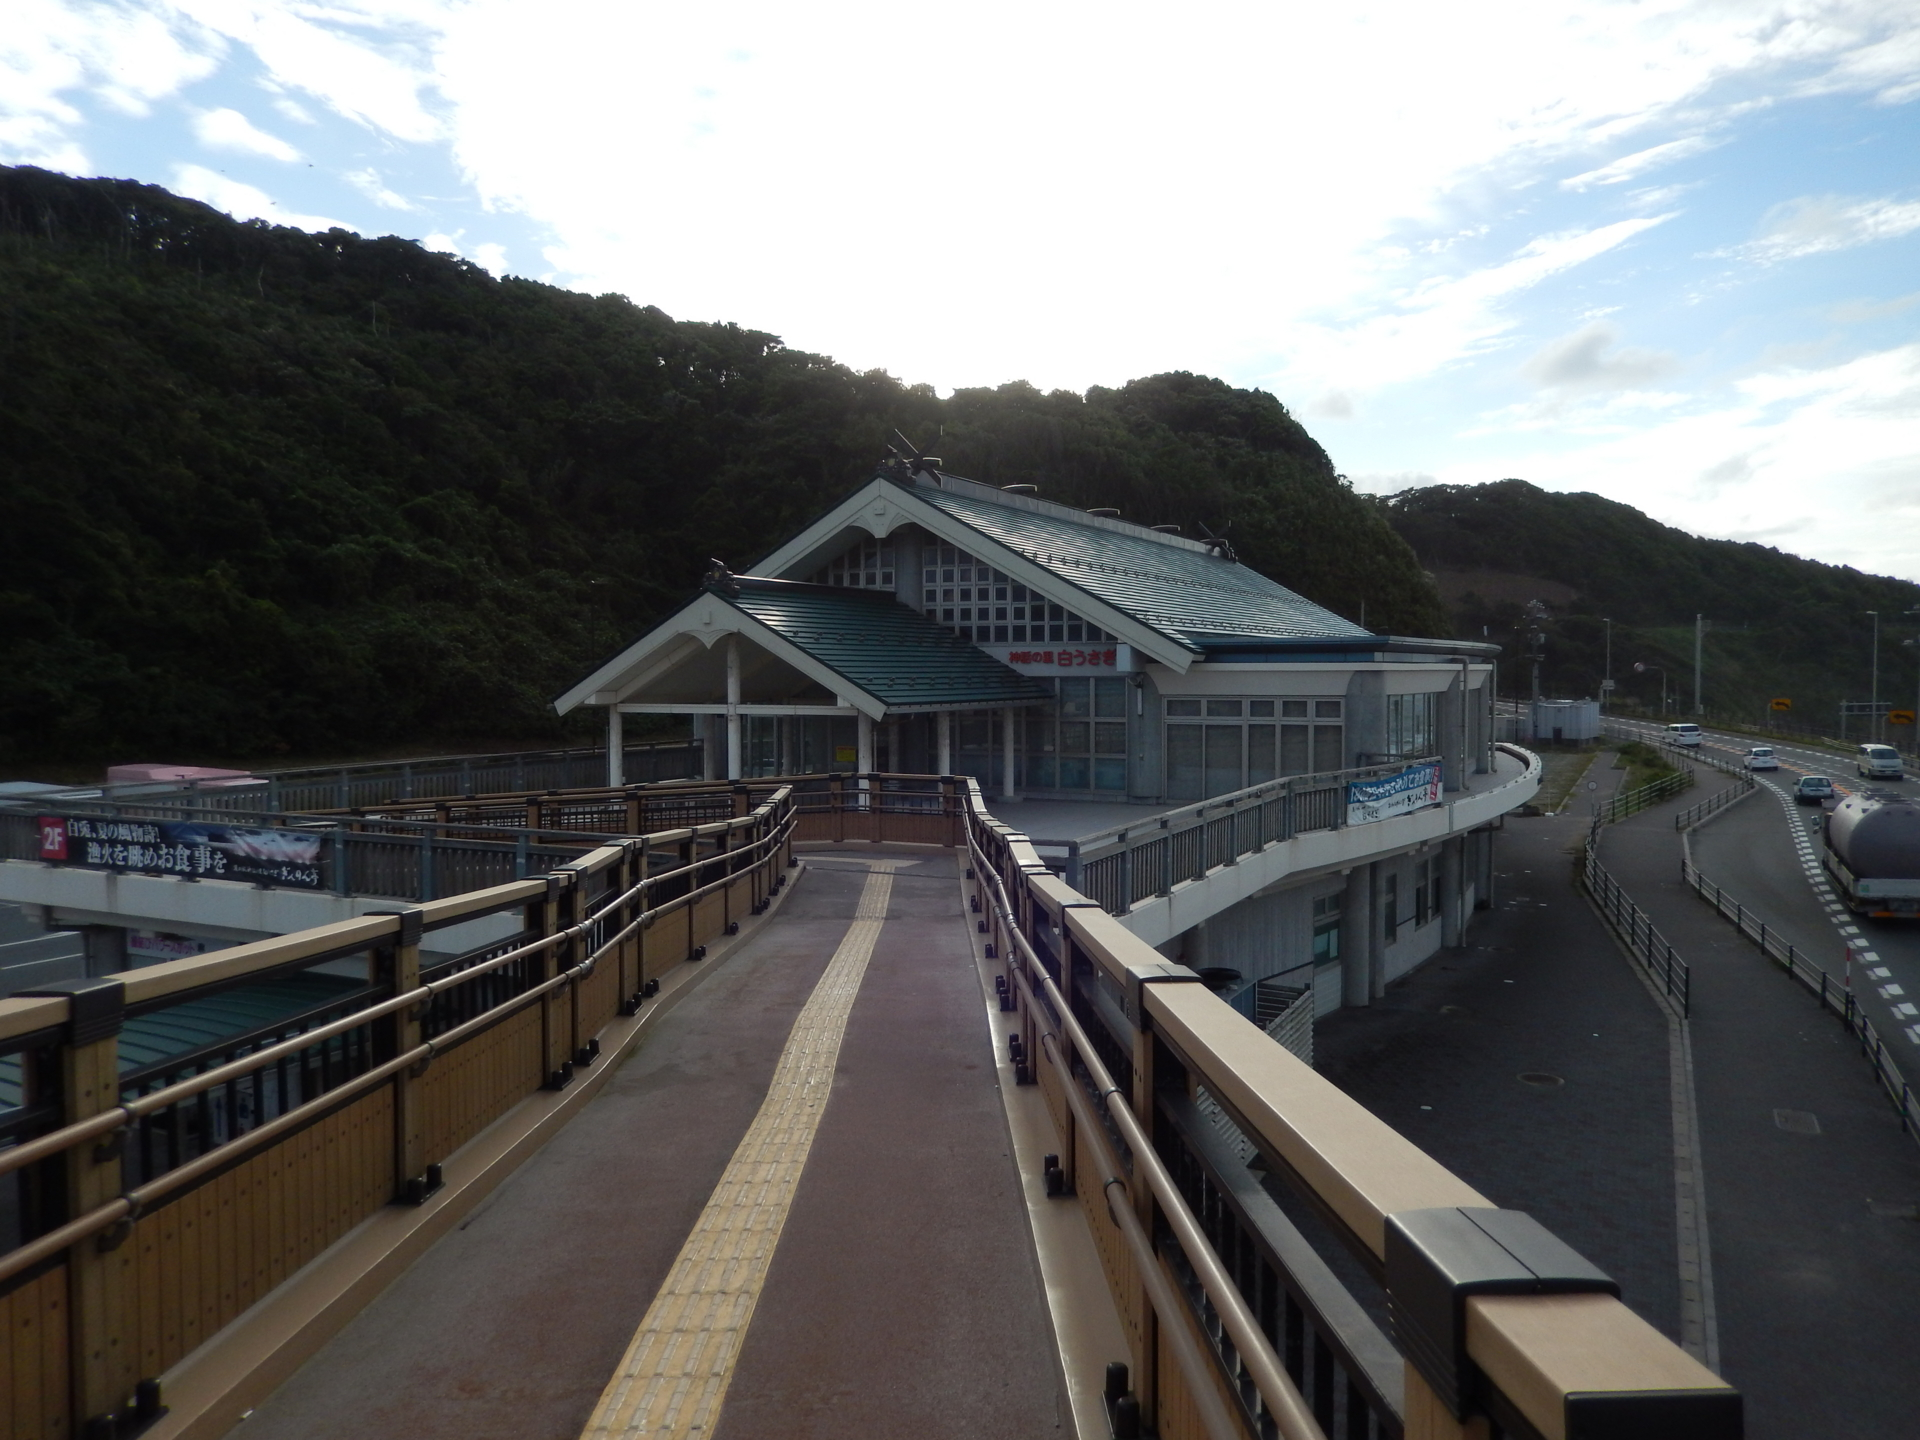 f:id:ToshUeno:20140926162540j:plain